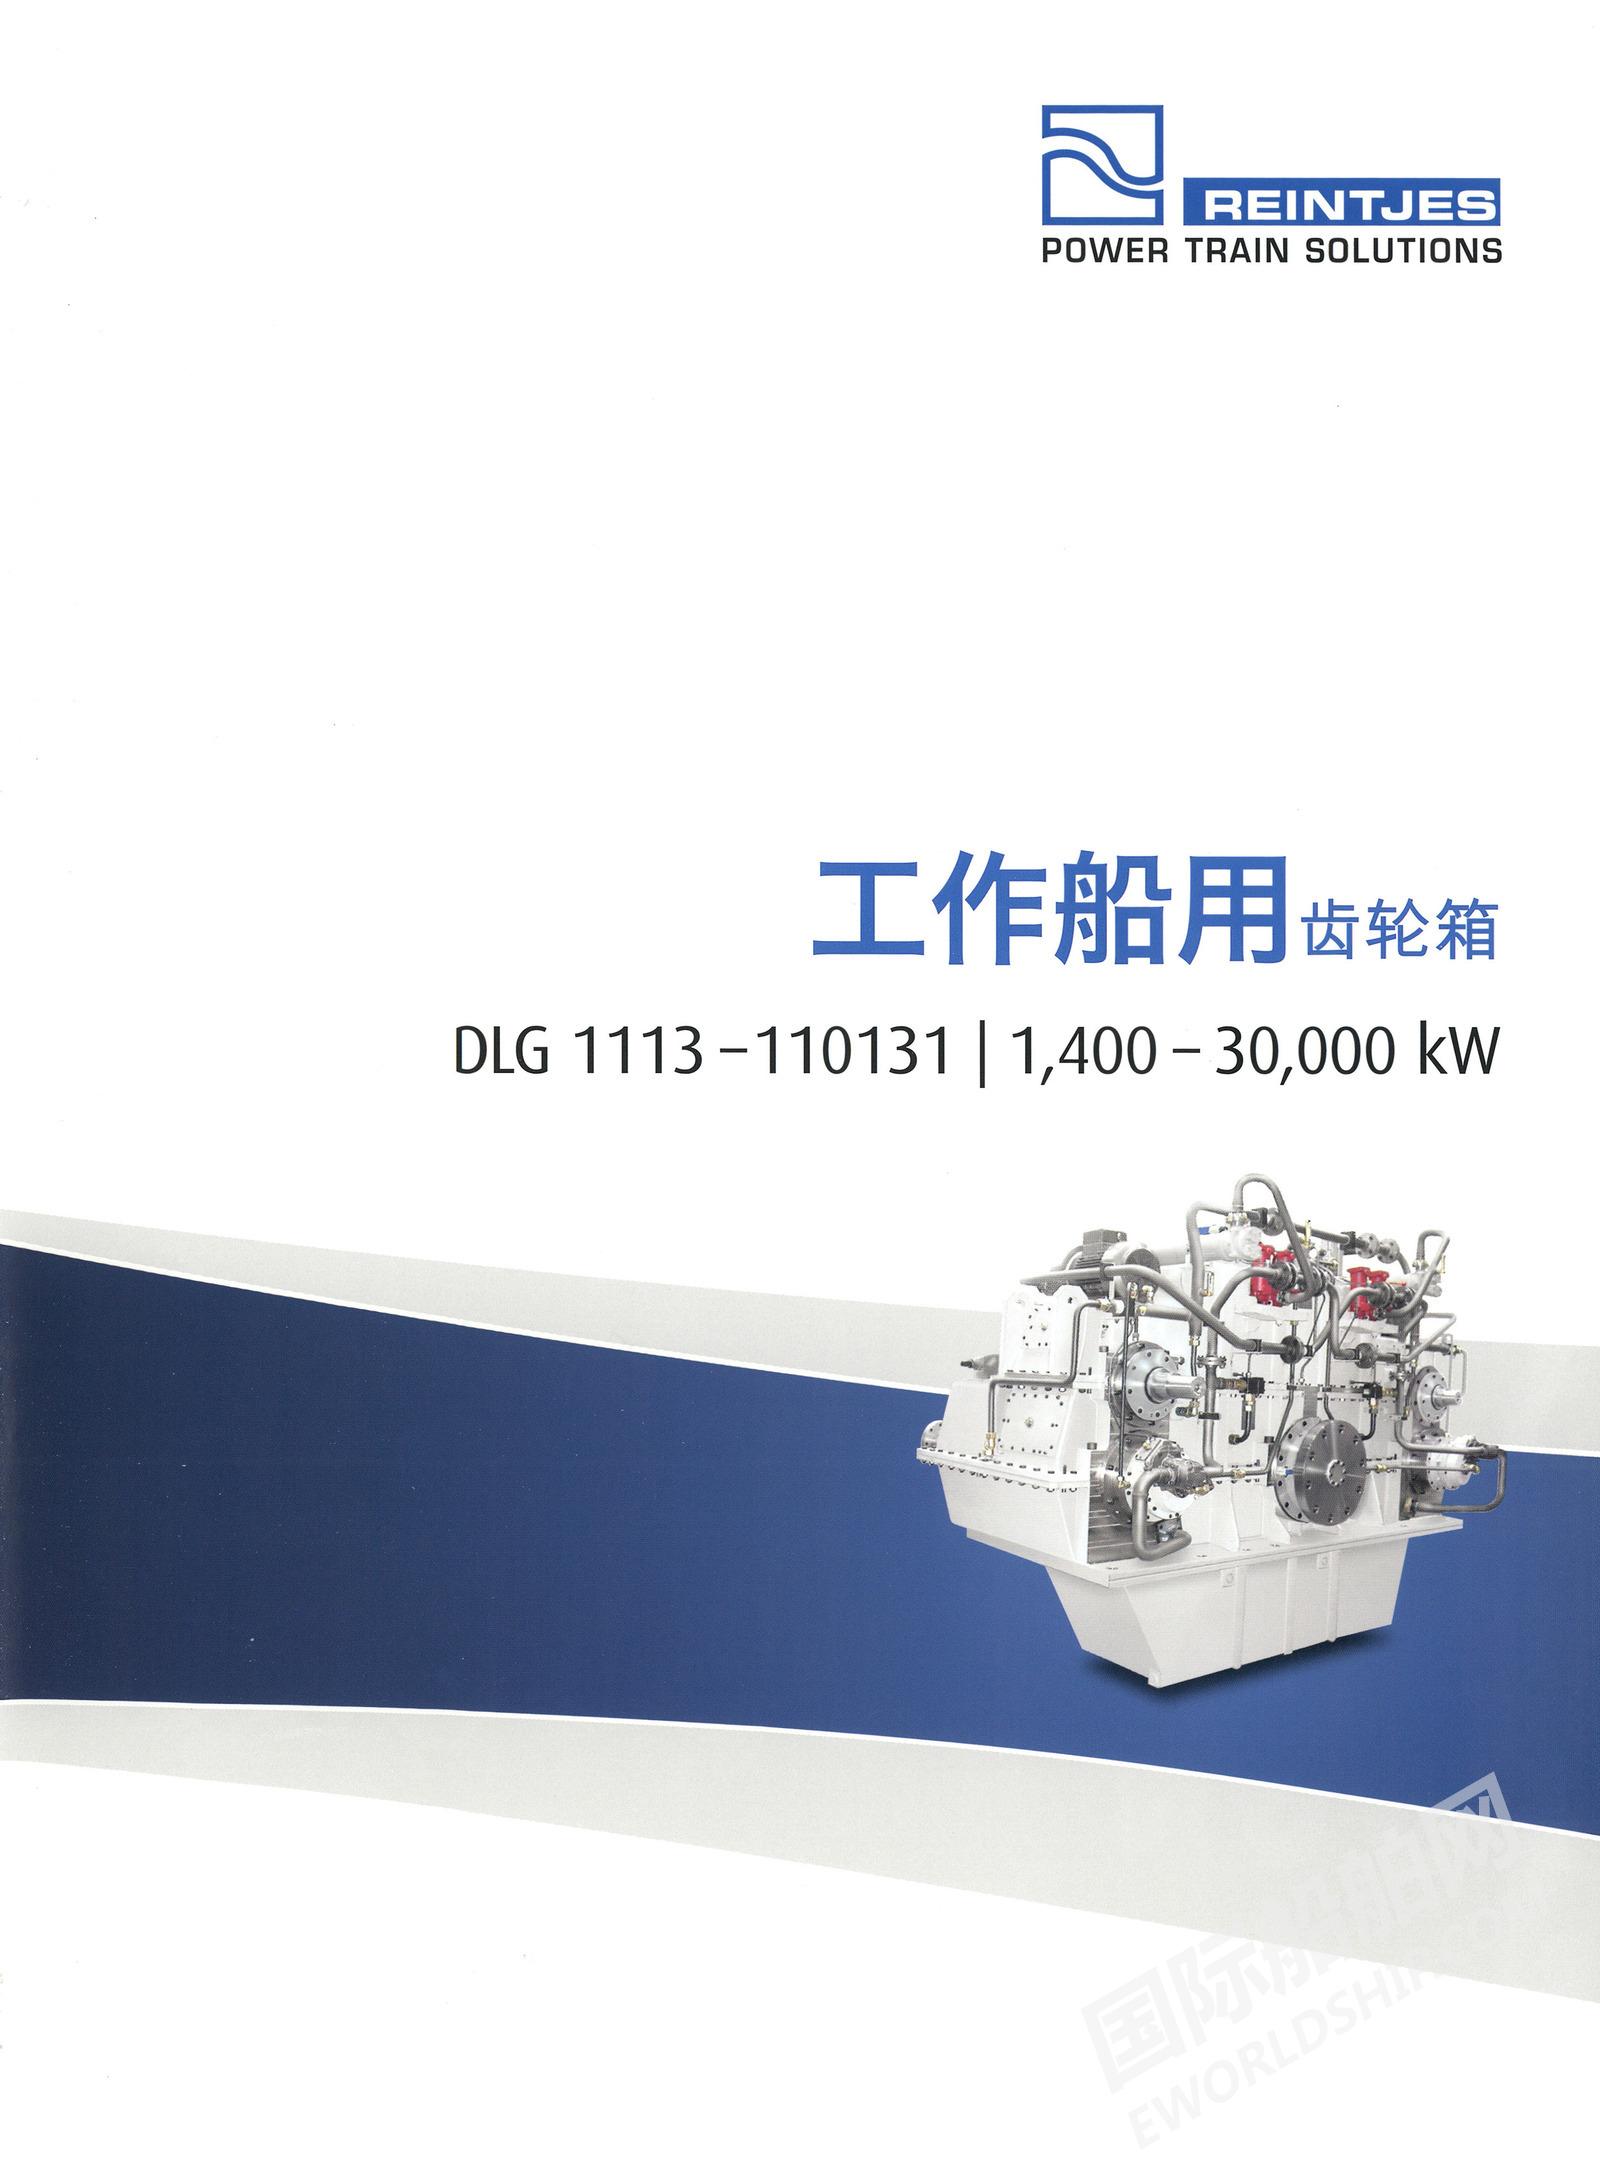 REINTJES 亚太公司上海代表处 工作船用齿轮箱